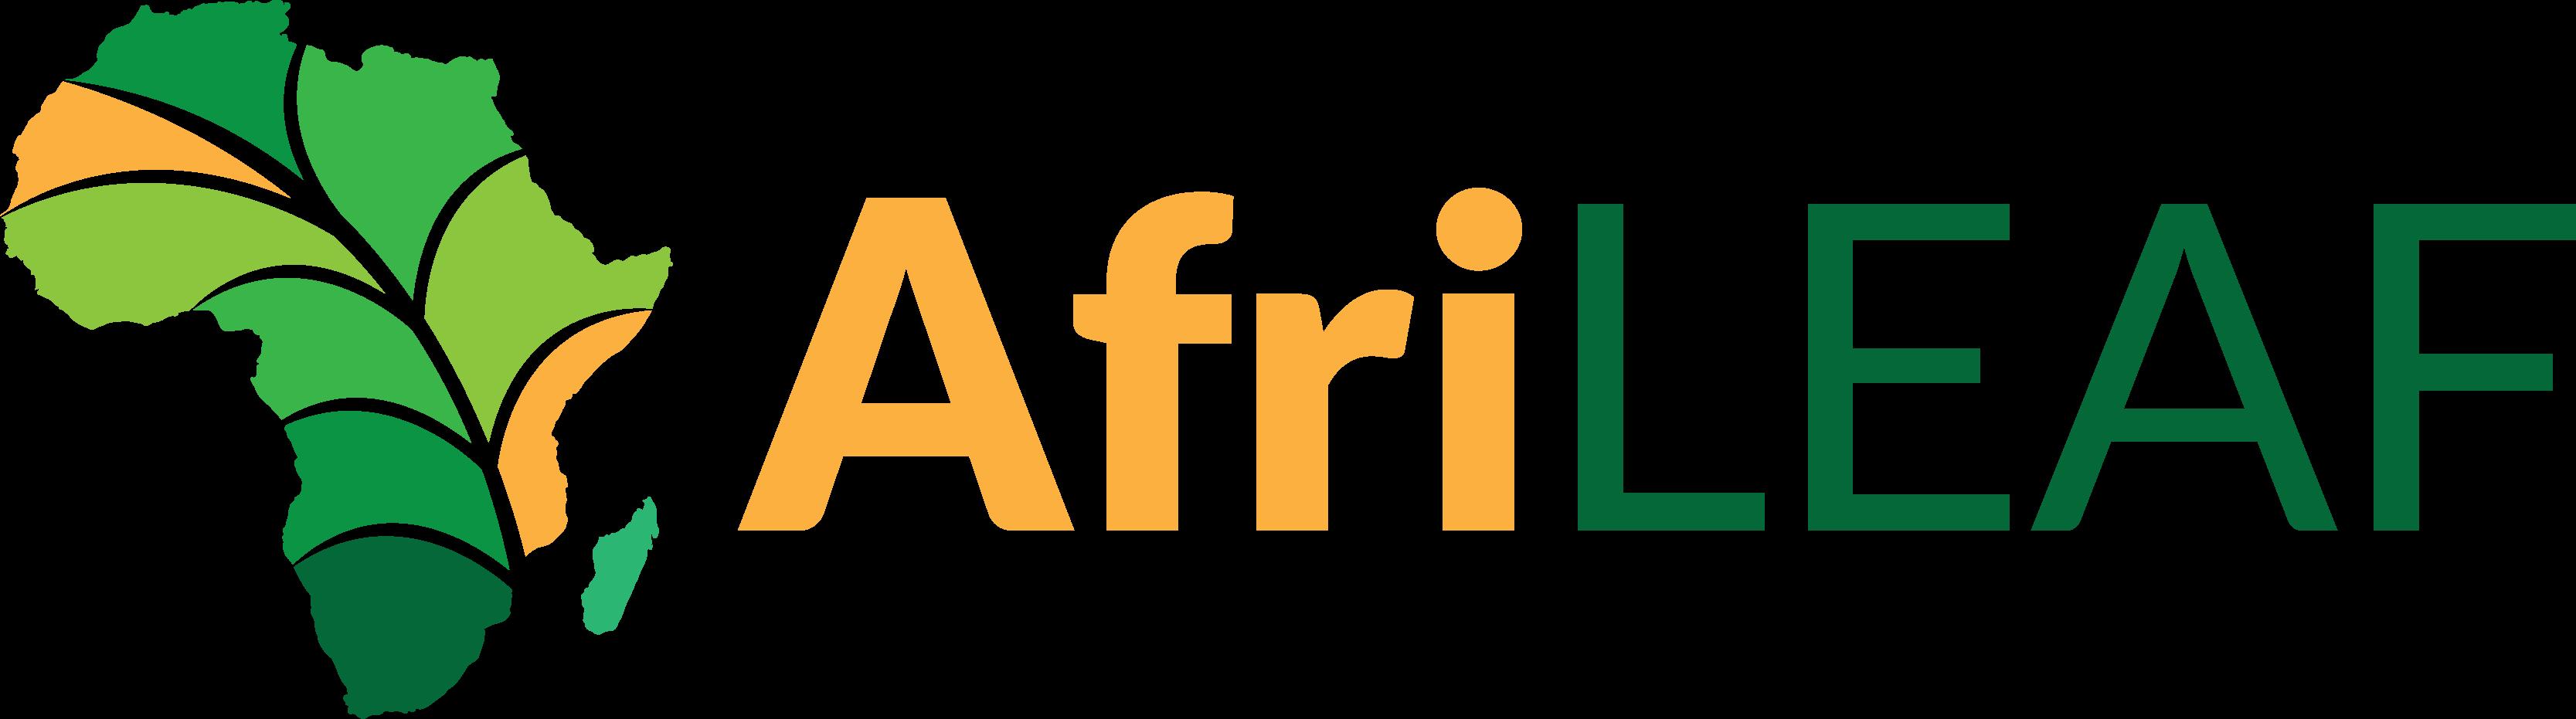 AfriLeaf